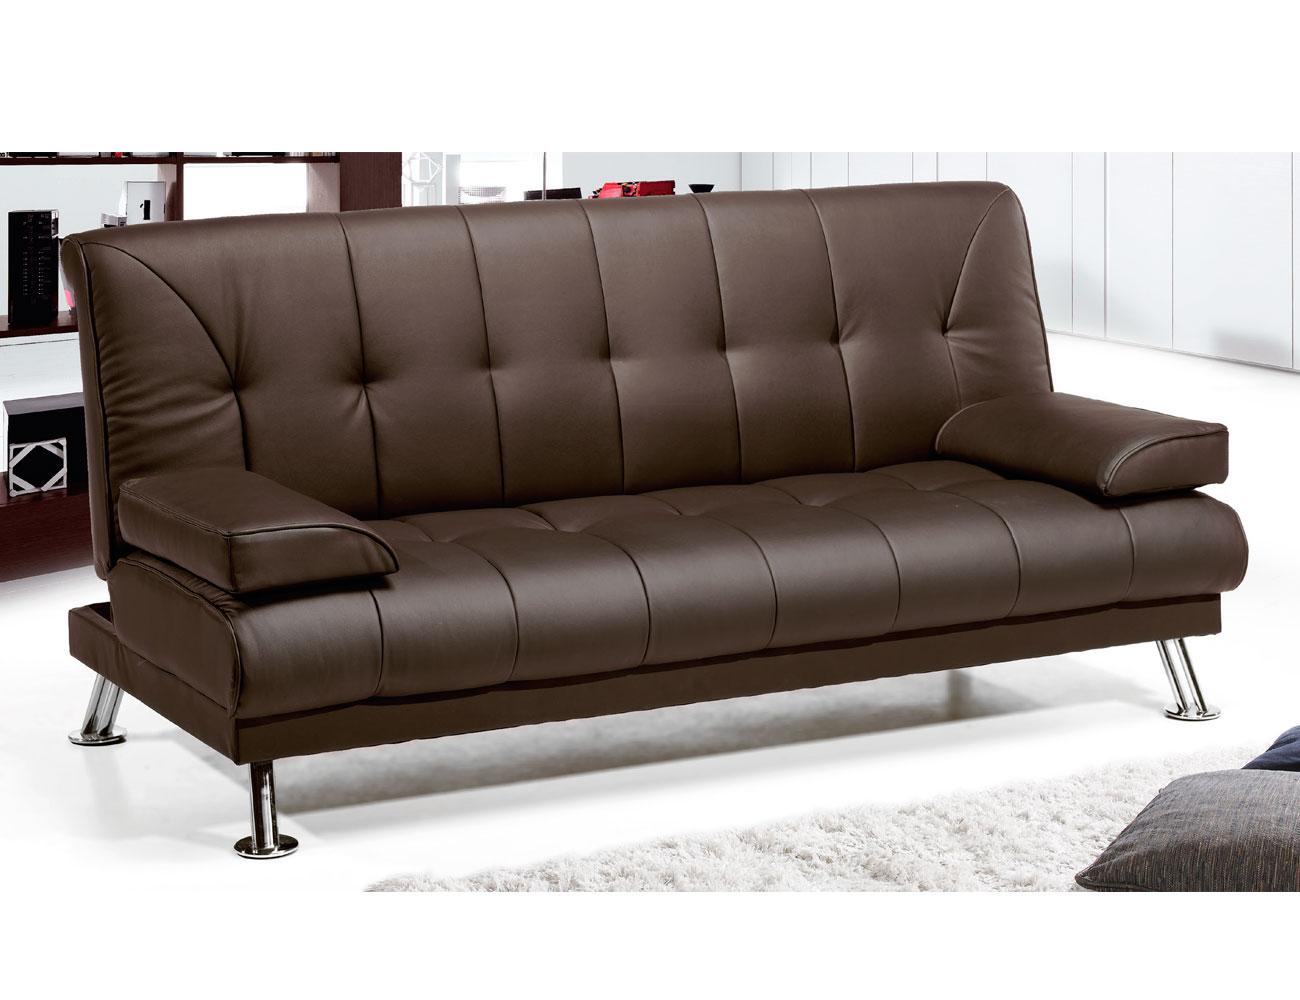 Sof cama tipo libro con respaldo alto 7271 factory for Sofa cama opiniones